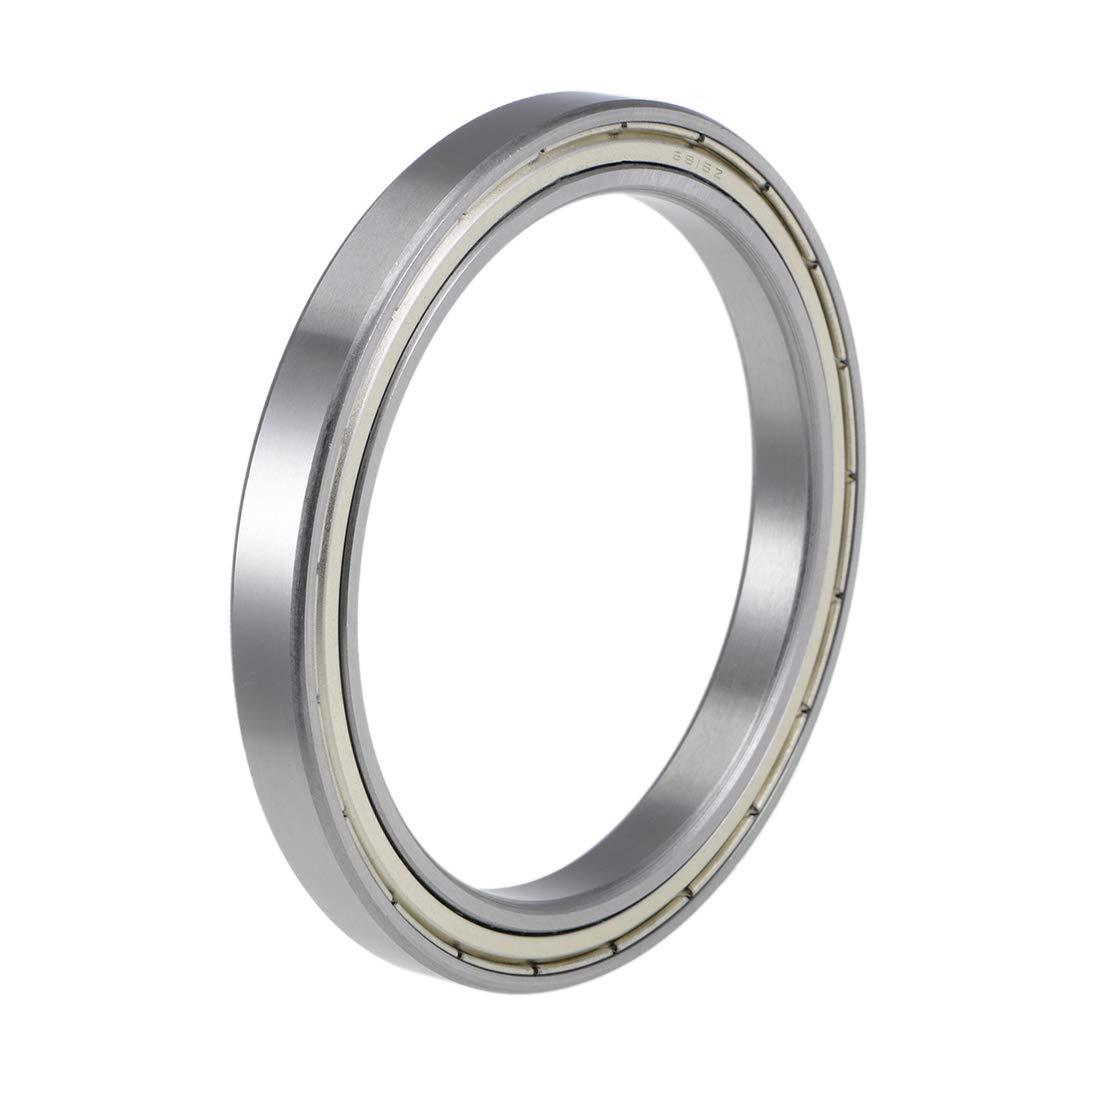 uxcell 6815ZZ Deep Groove Ball Bearings 75mm Inner Dia 95mm OD 10mm Bore Double Shielded Chrome Steel Z2